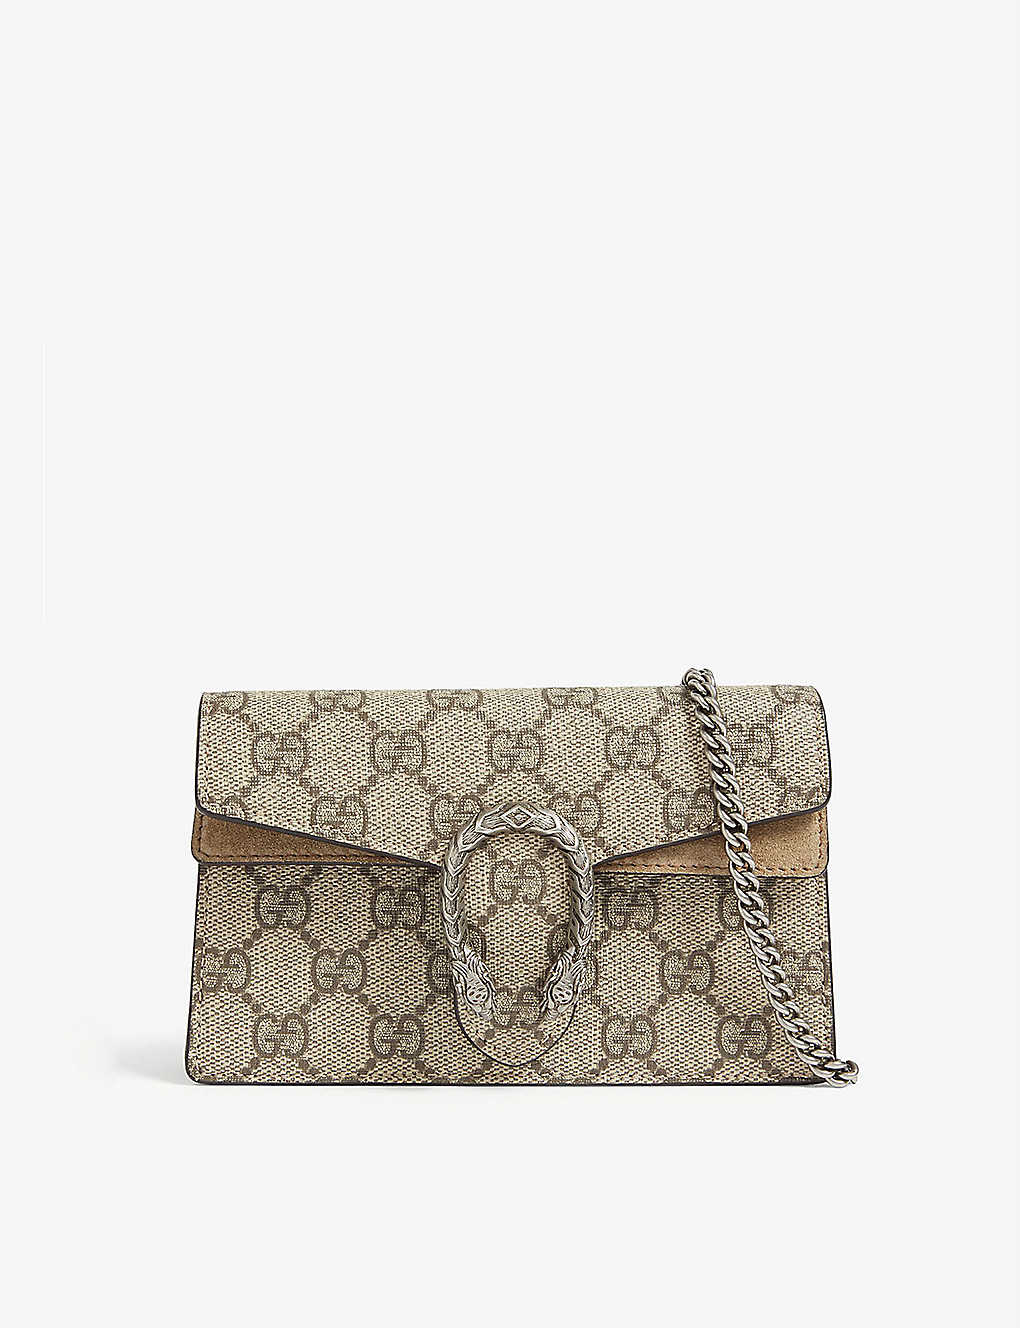 GUCCI: GG Supreme Dionysus super mini shoulder bag